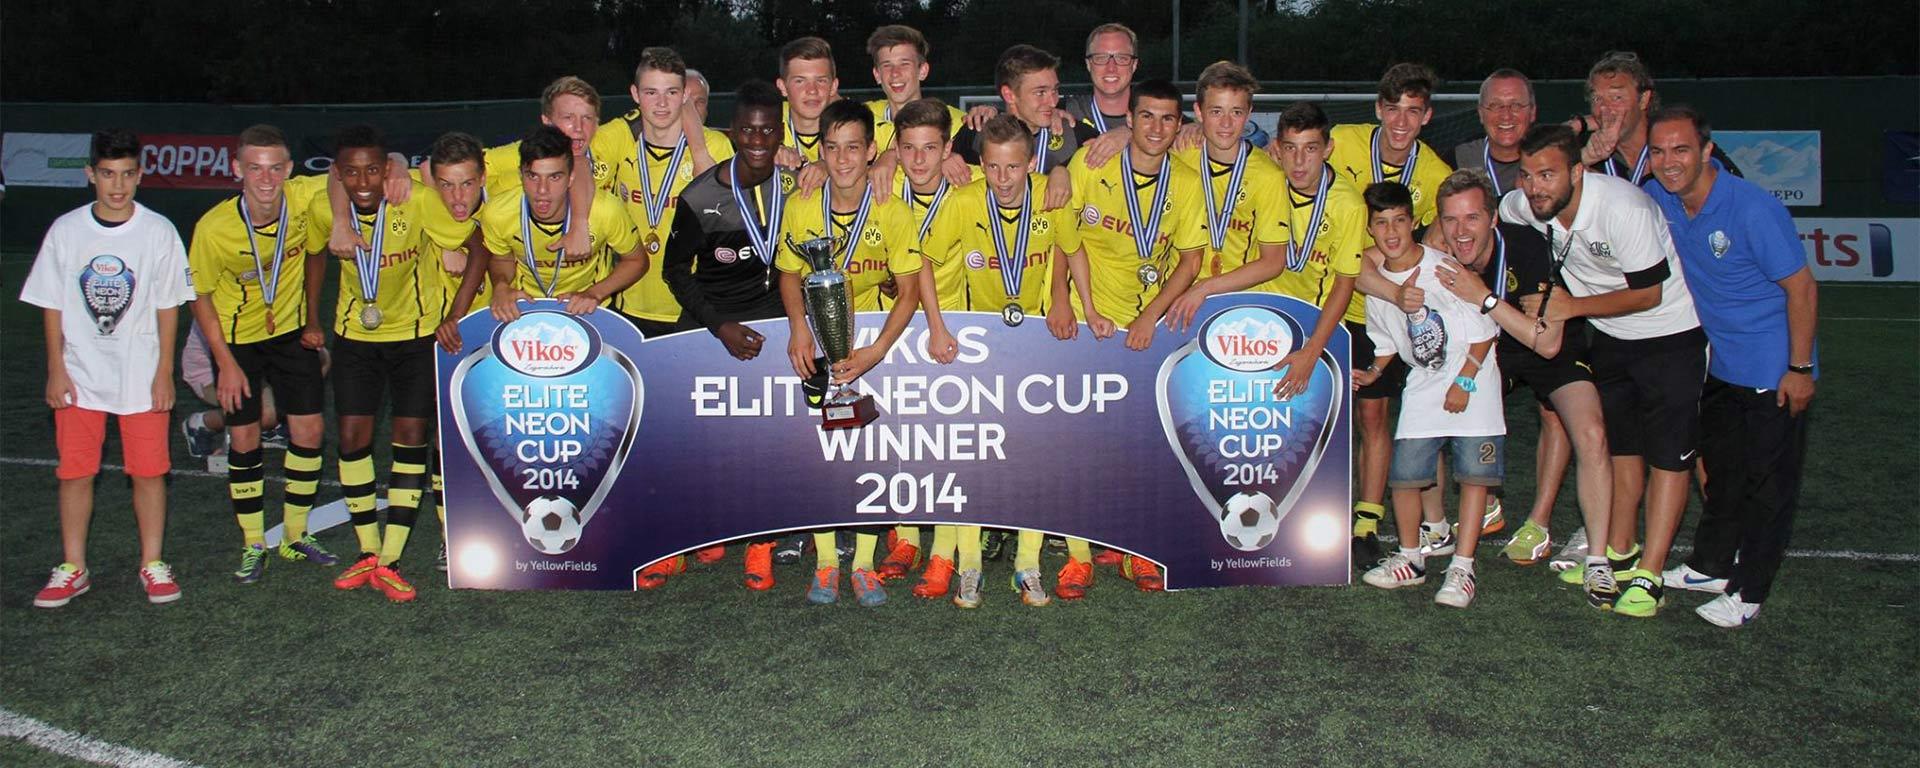 Vikos Elite Neon Cup 2014